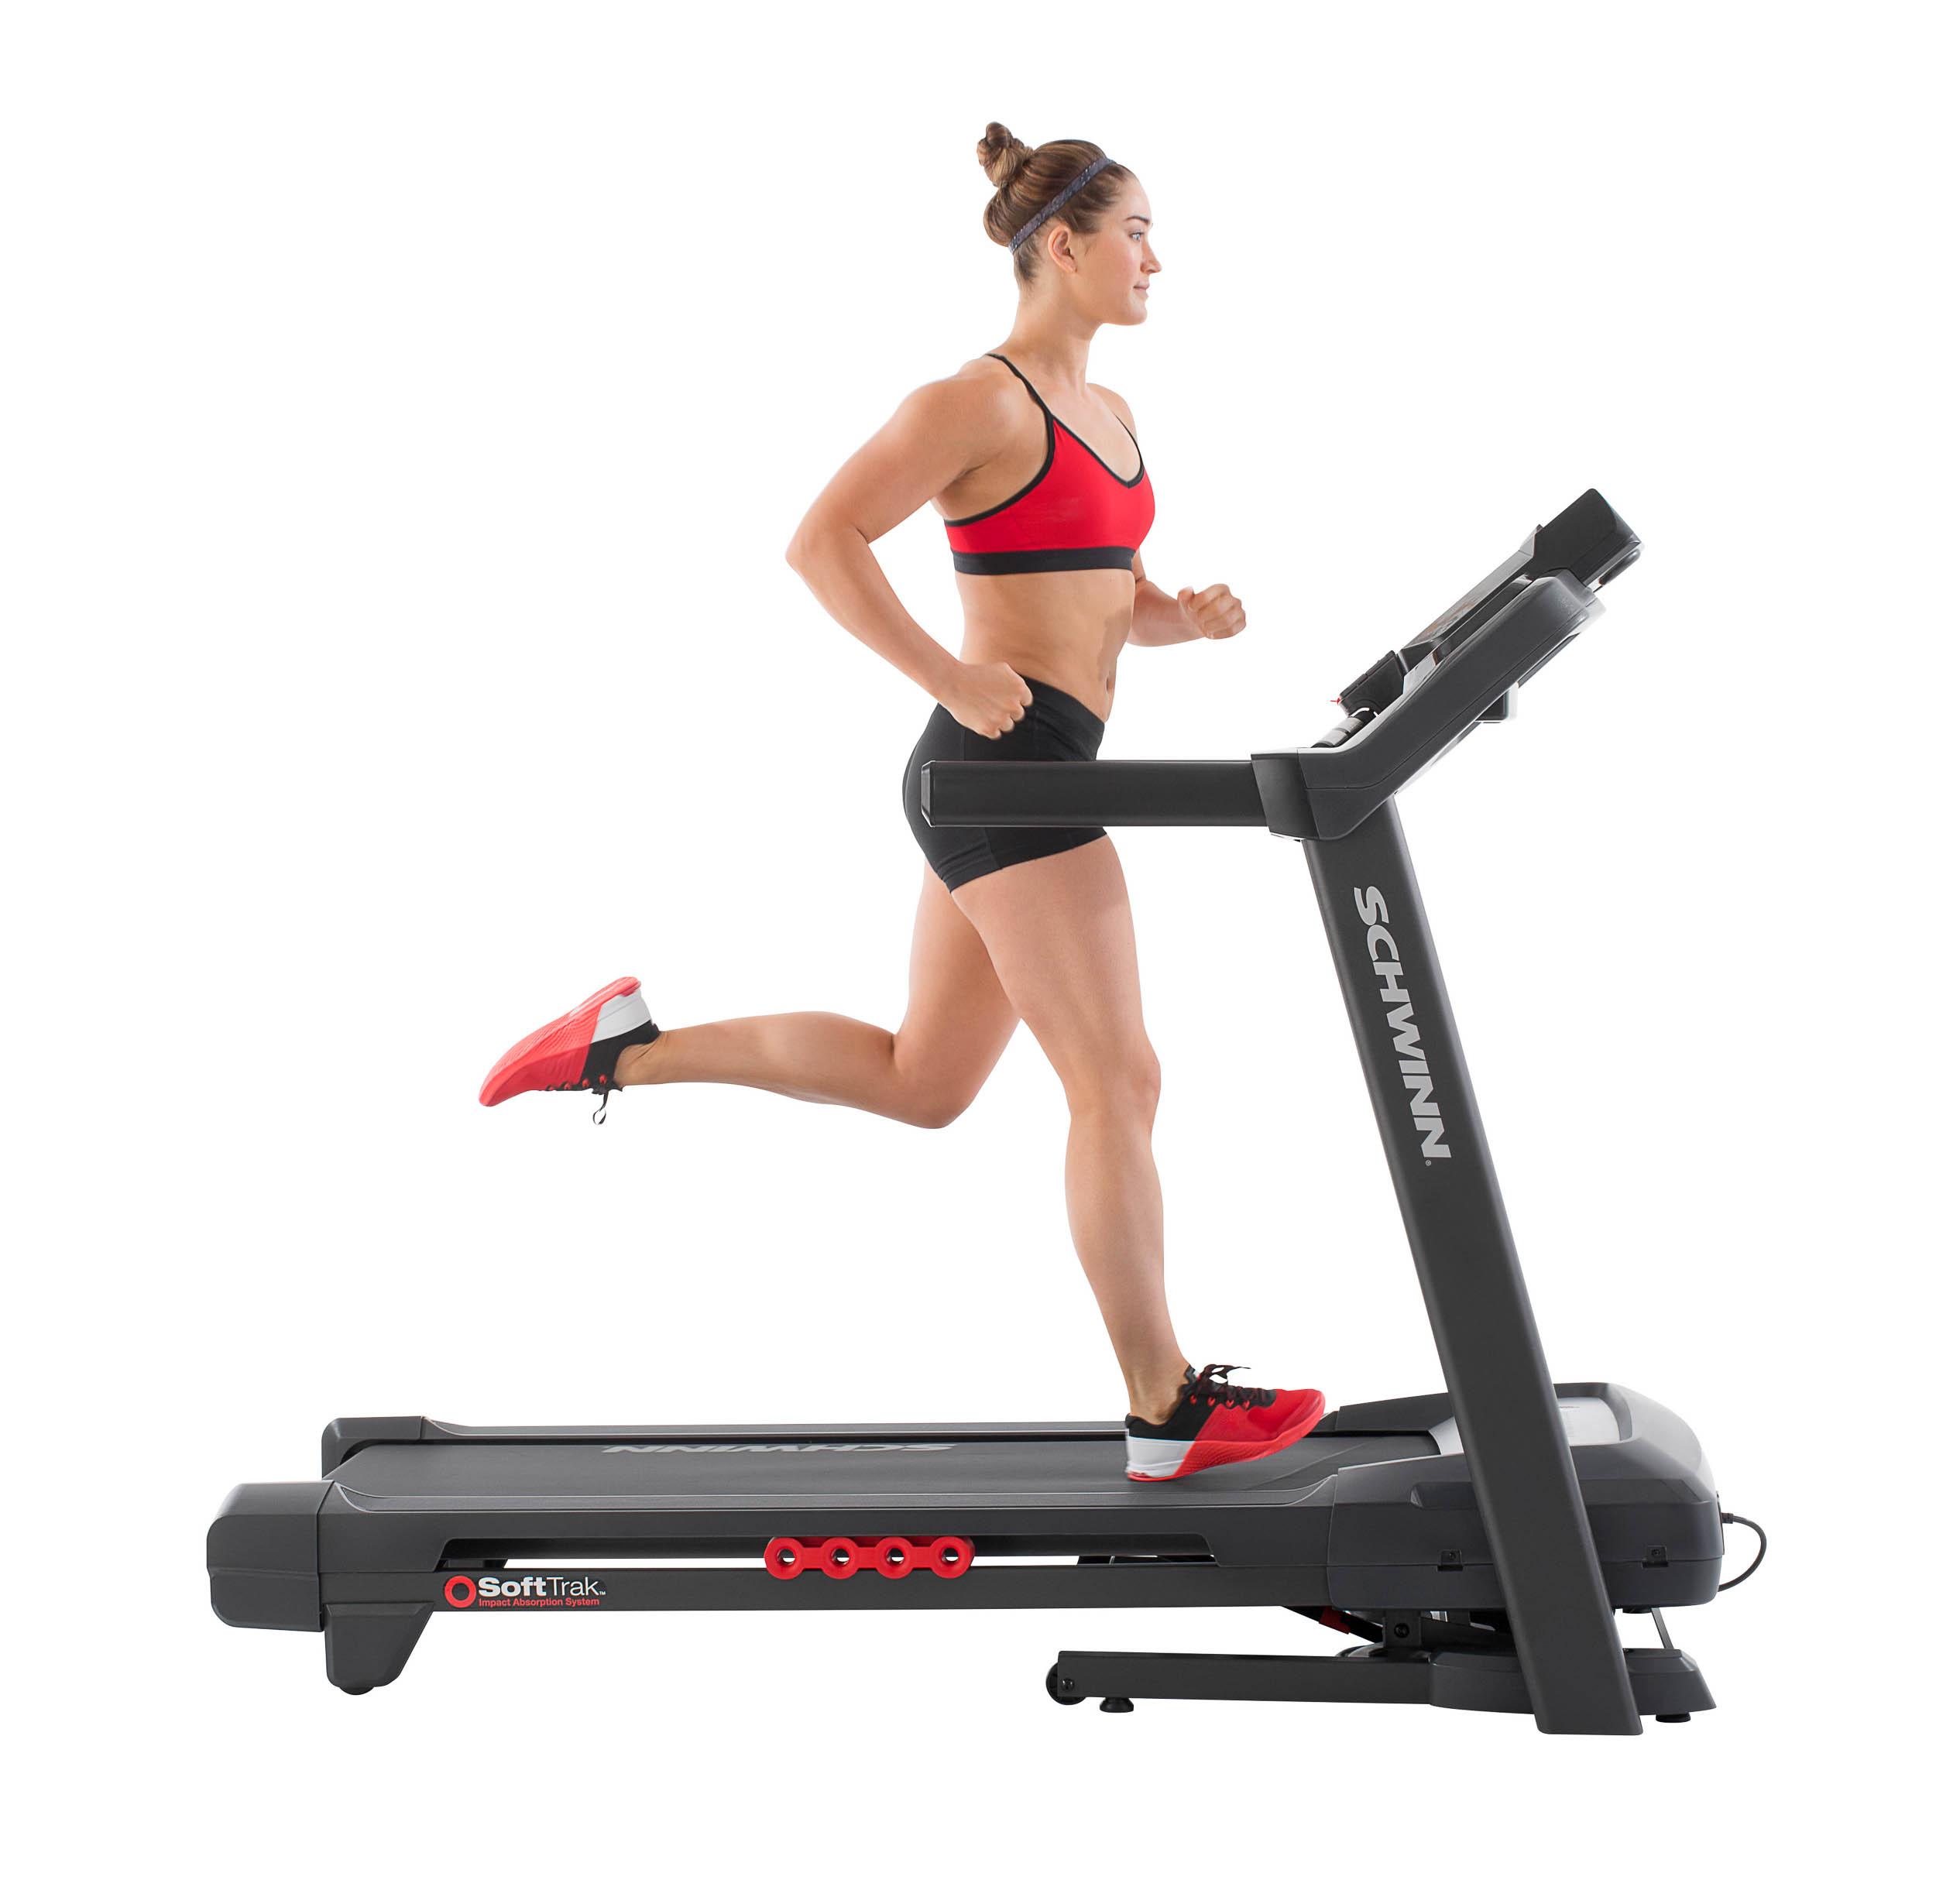 Nautilus_Direct_116099_Schwinn Treadmill 830 Studio Profile Julie_139 copy.jpg